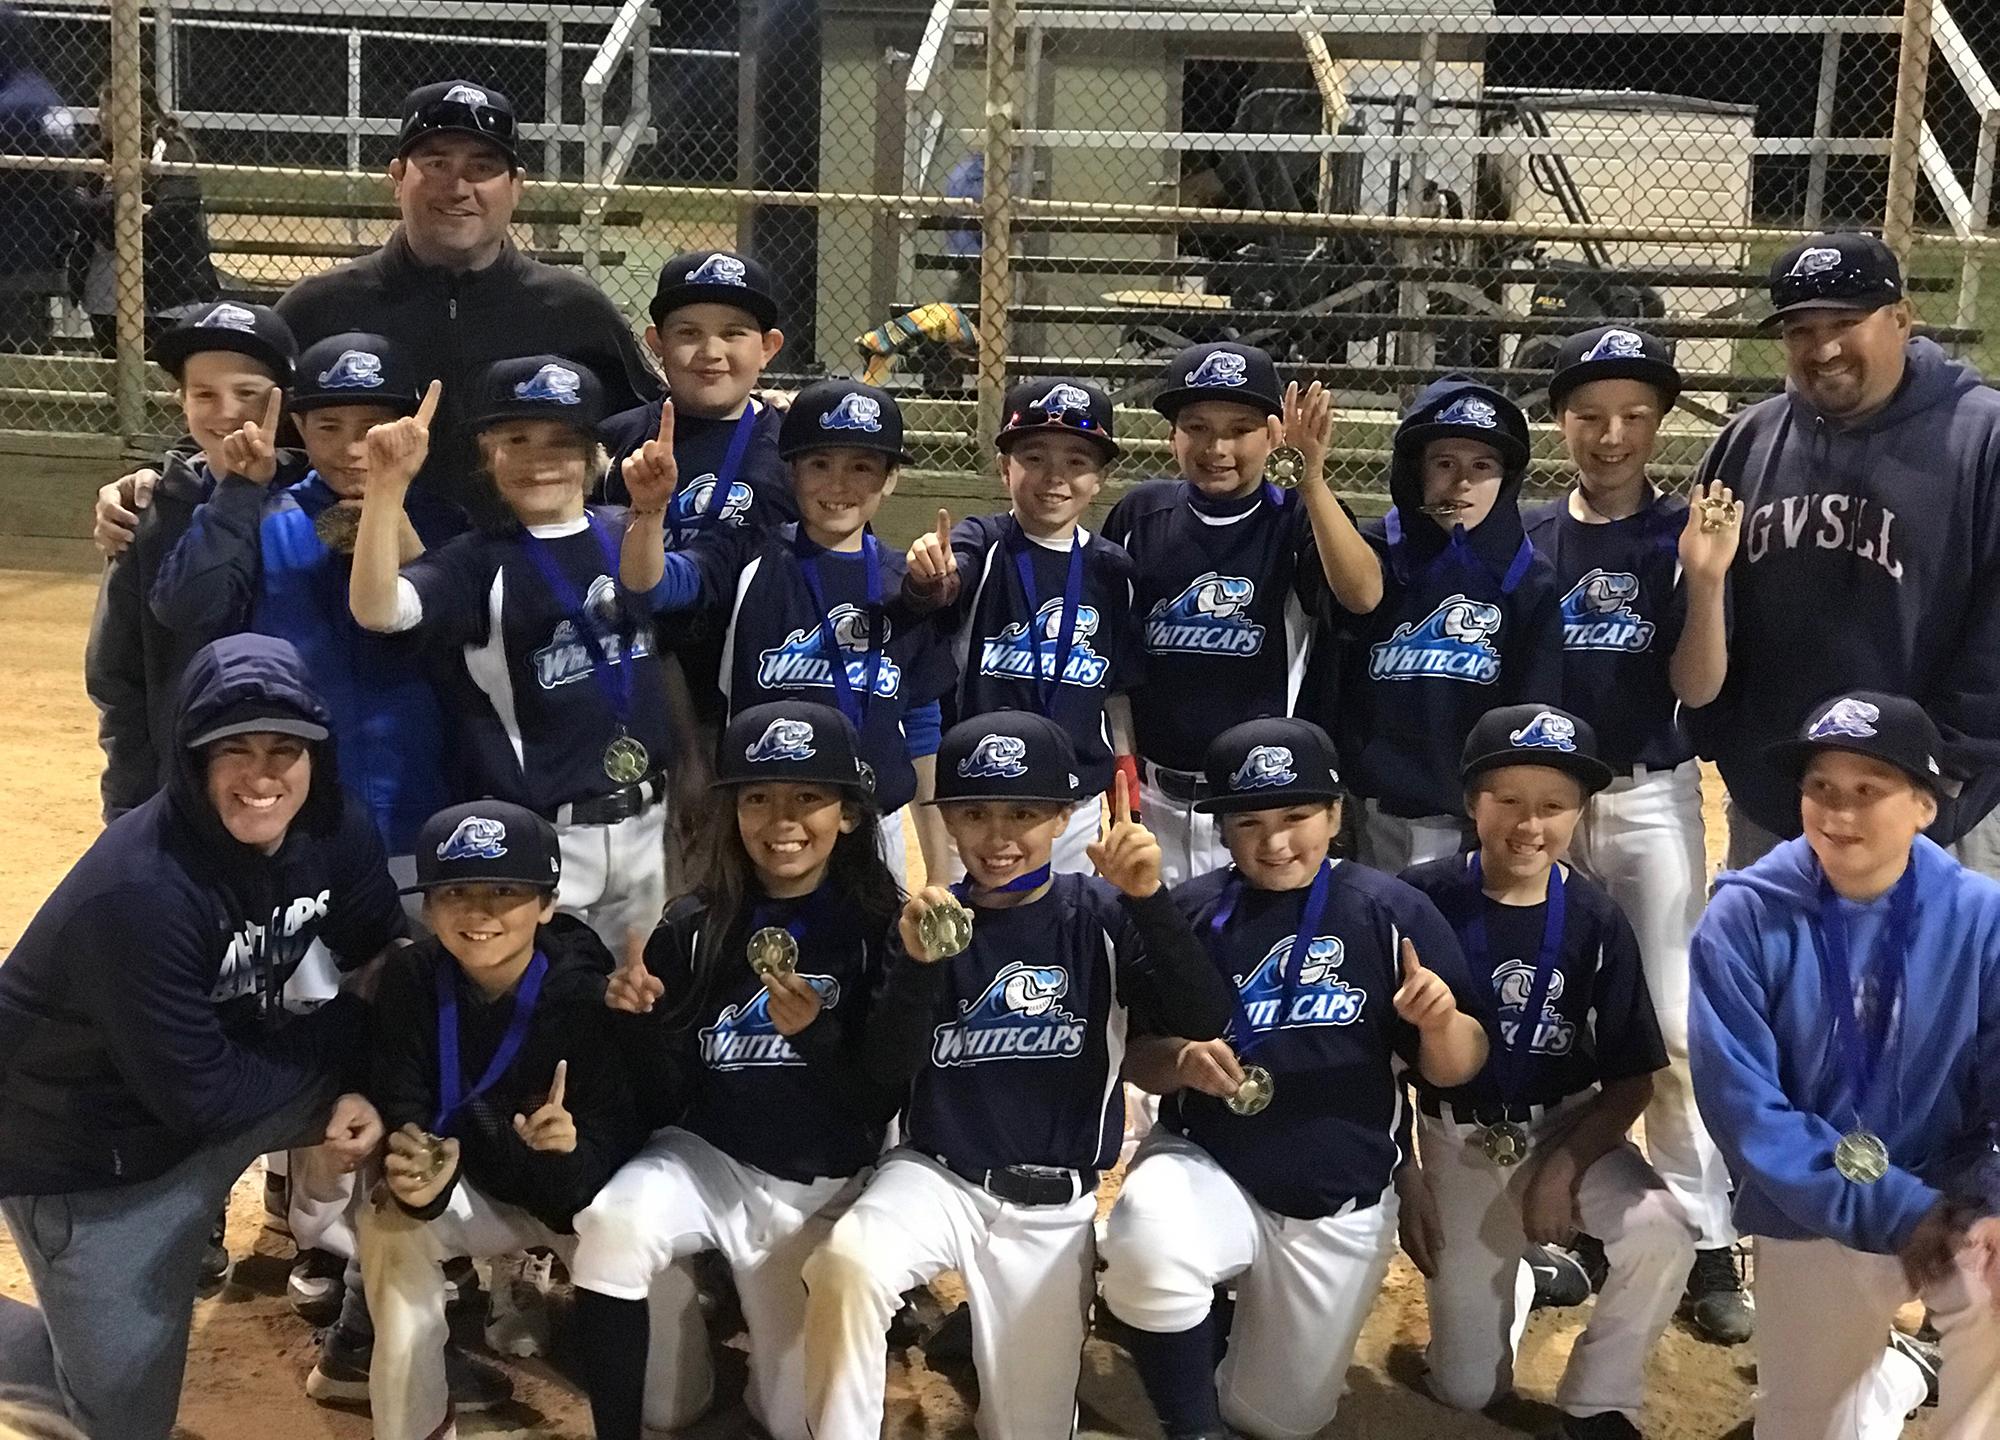 e379b4f375c 2018 Santa Barbara (CA) Whitecaps U10 Team wearing Top Spin jerseys